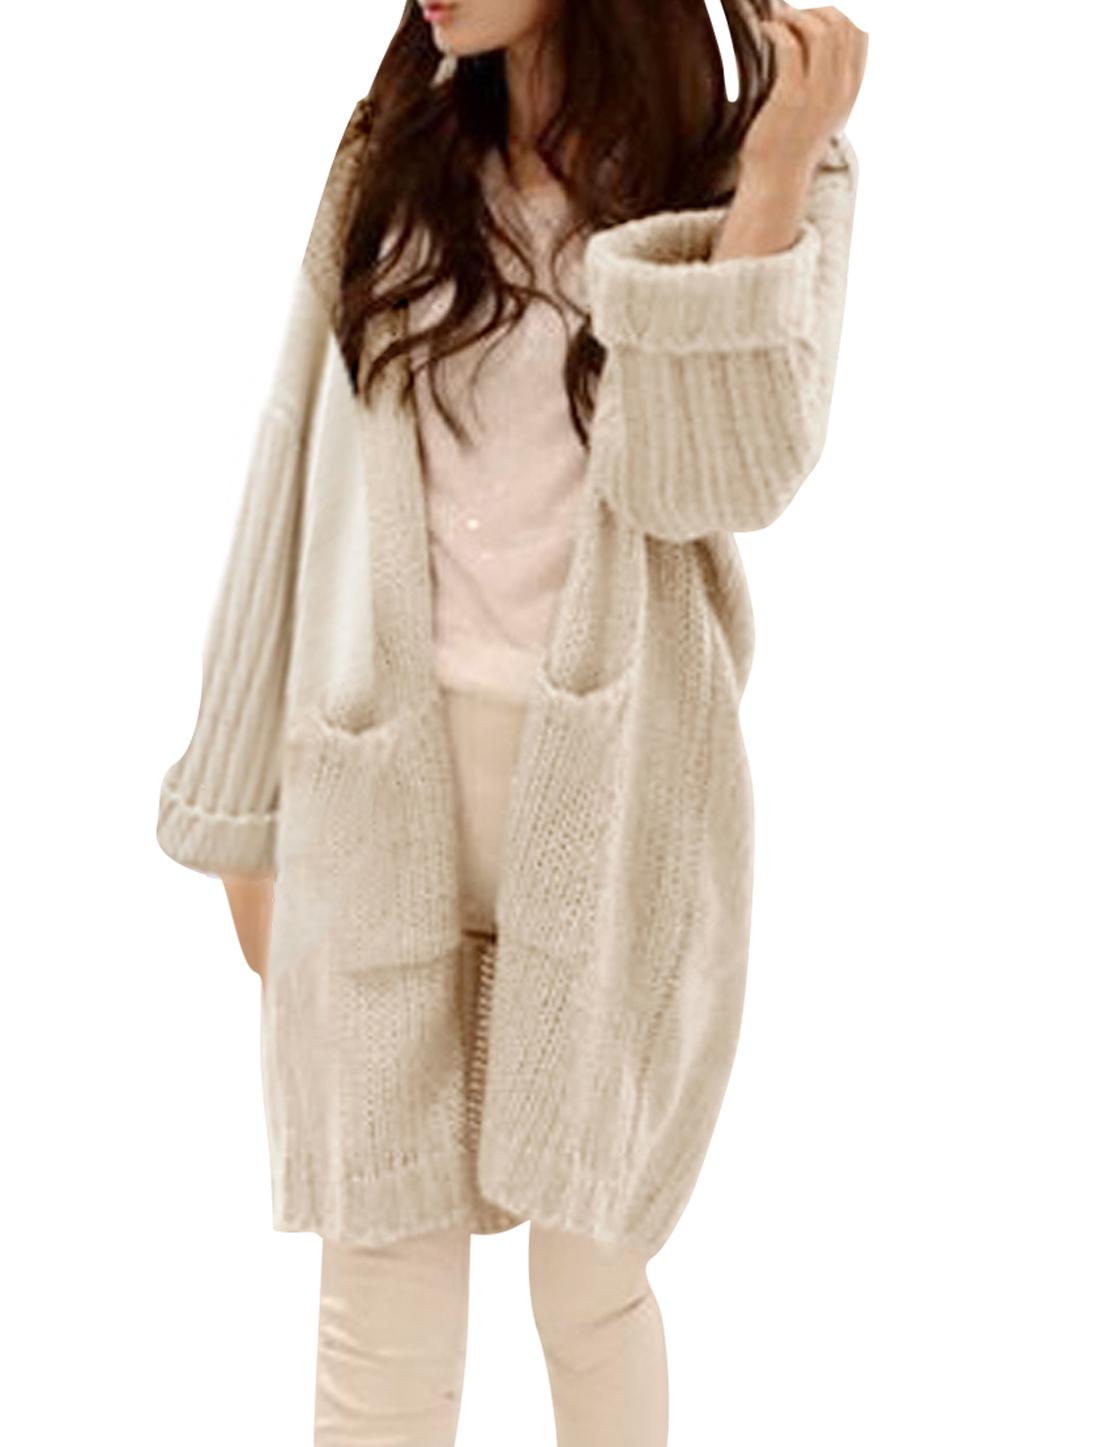 Lady Long Sleeve Front Opening Pockets Decor Beige Sweatercoat S